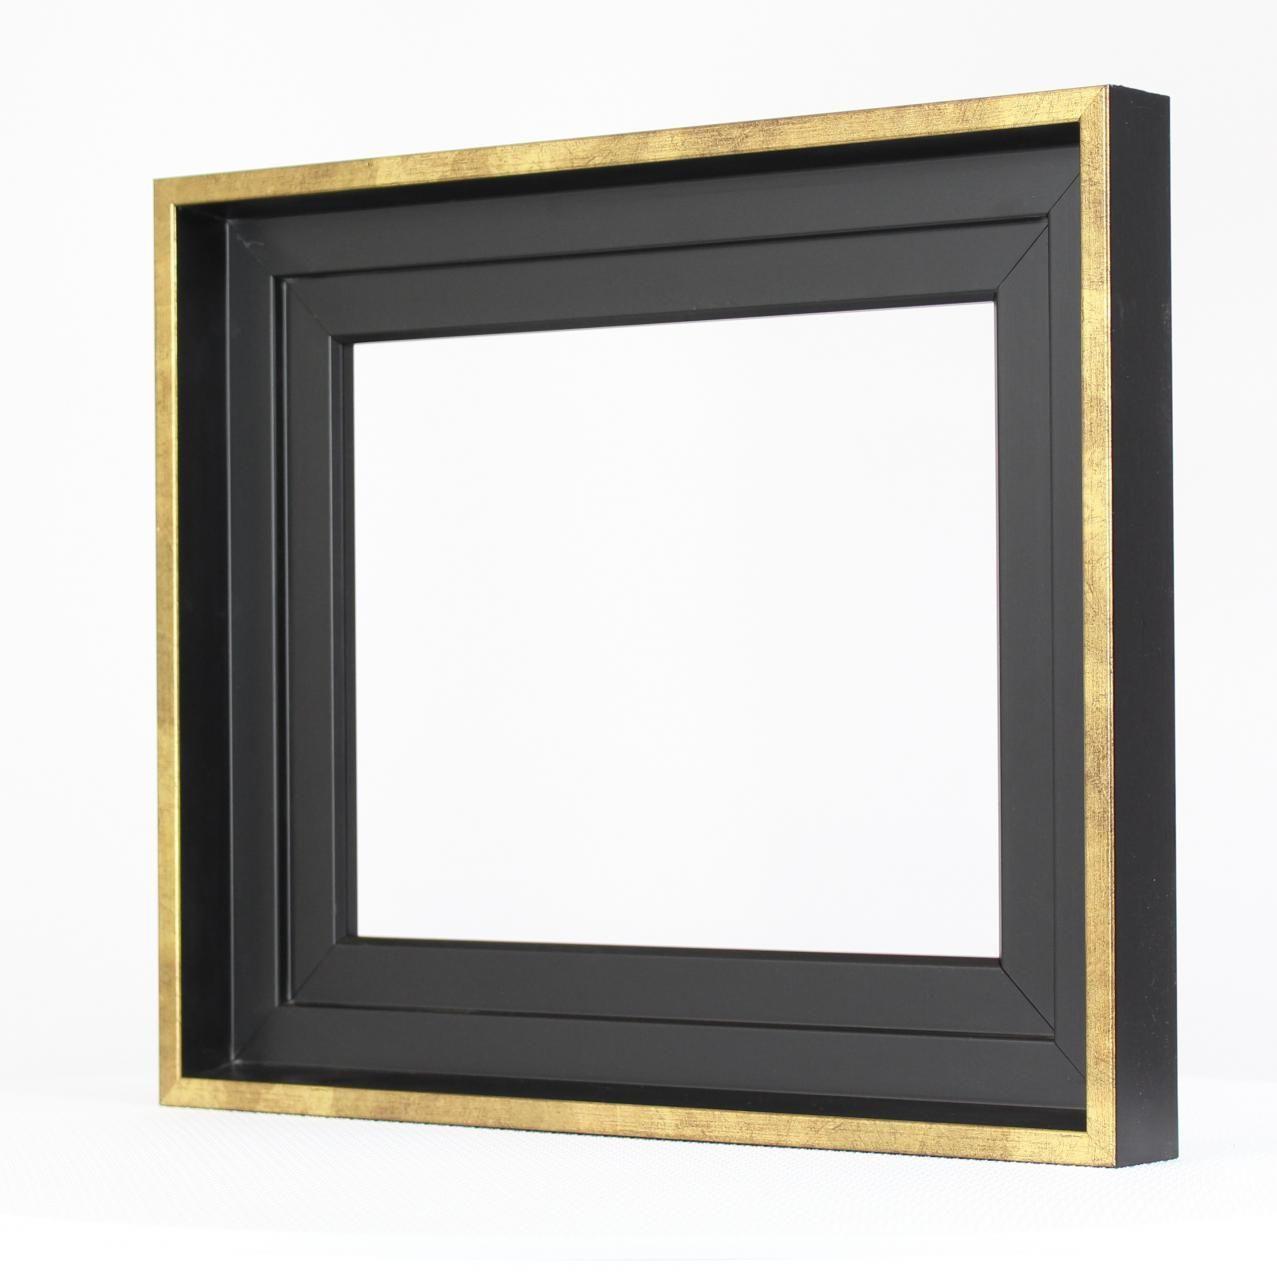 caisse-americaine-noir-or-73922g.jpg 1 277 × 1 280 pixels ...